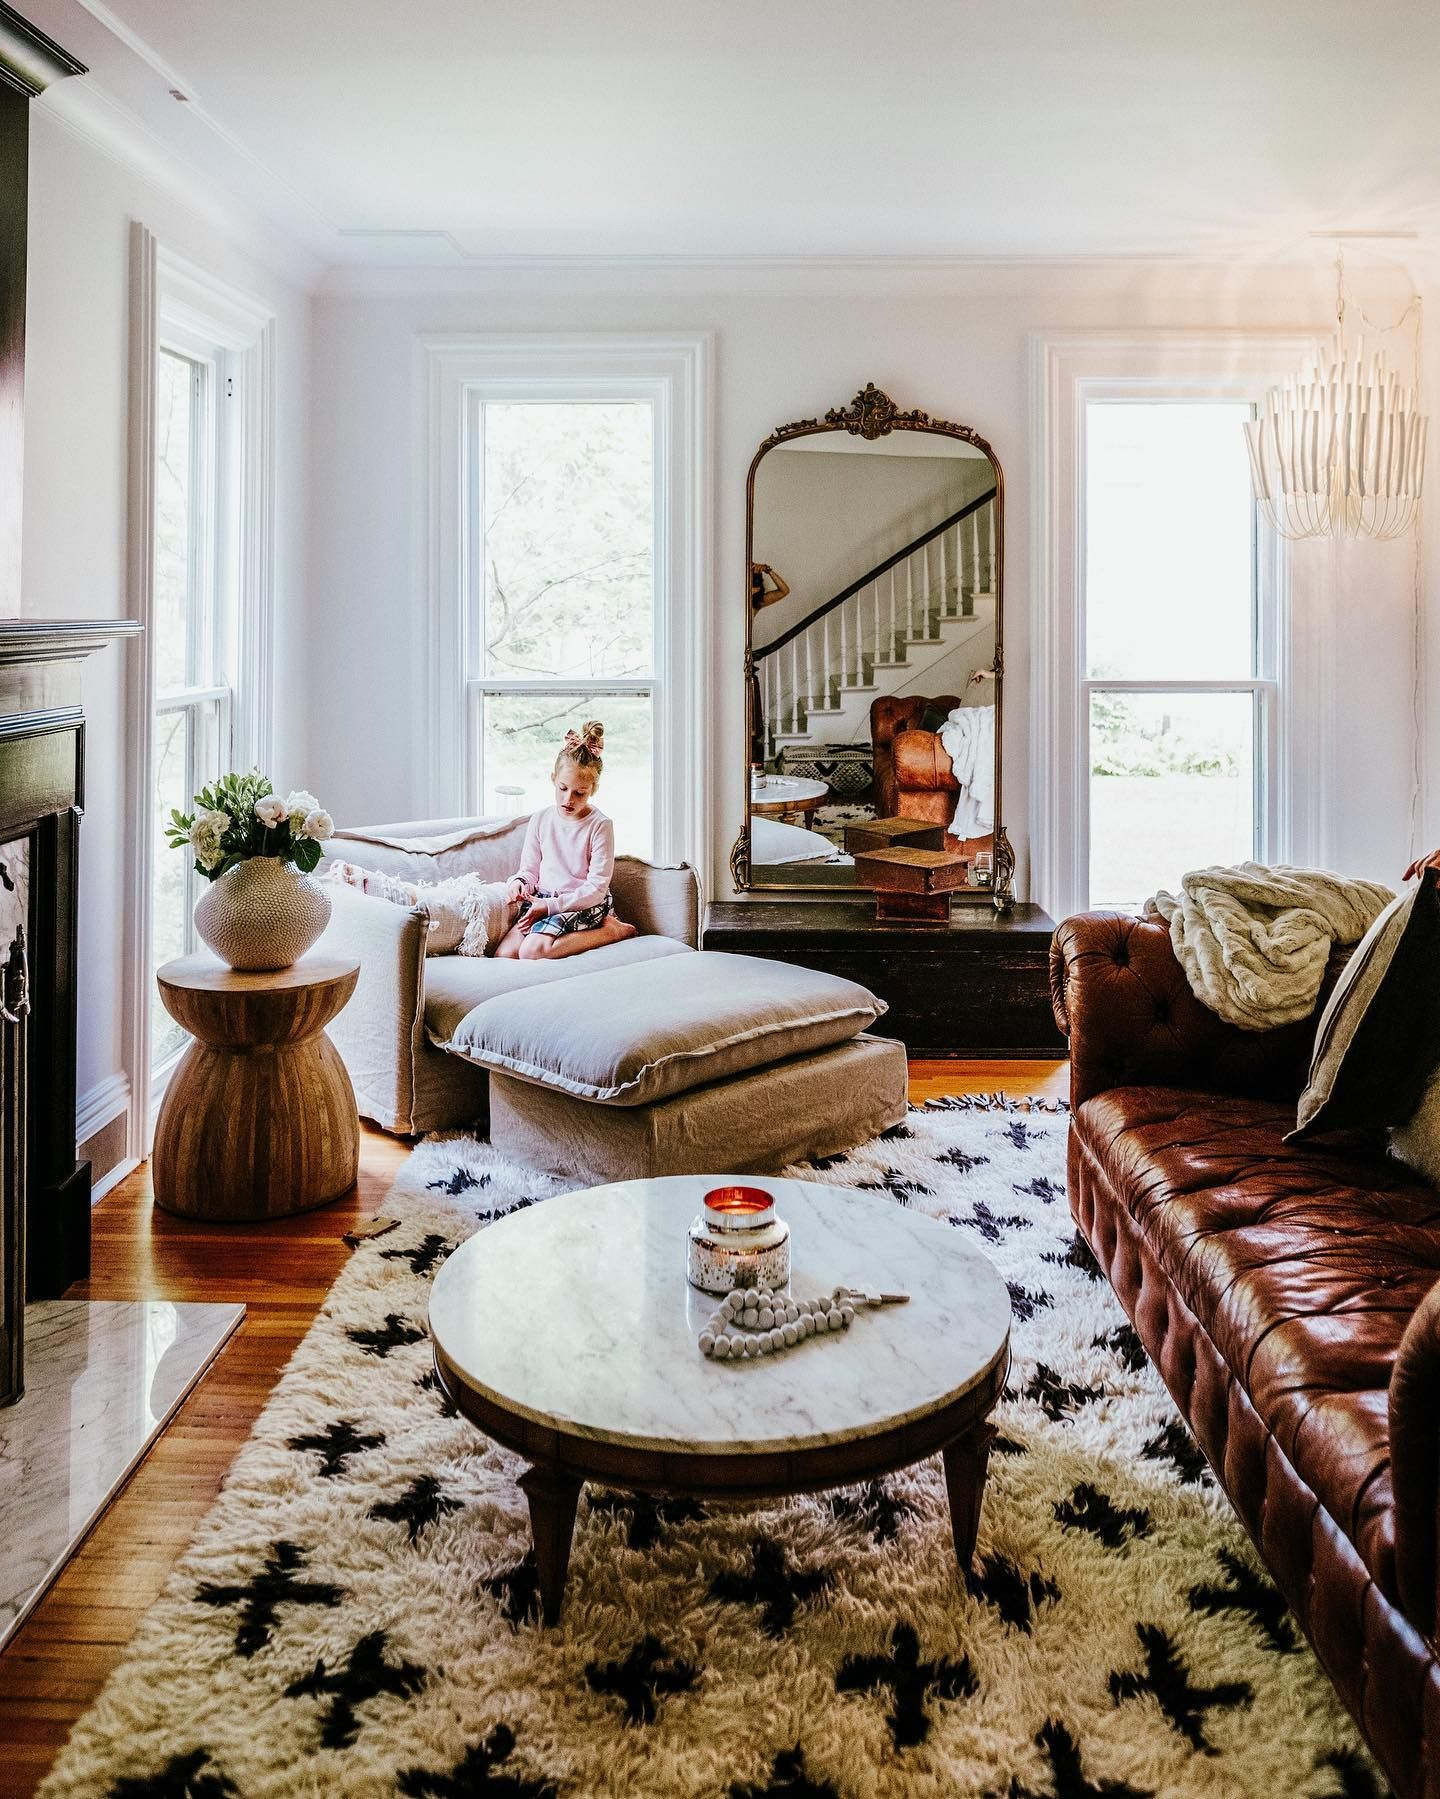 Neva Chair 70 Feather Fill Armchair W Slipcover Design Home Decor Retro Home Retro Home Decor